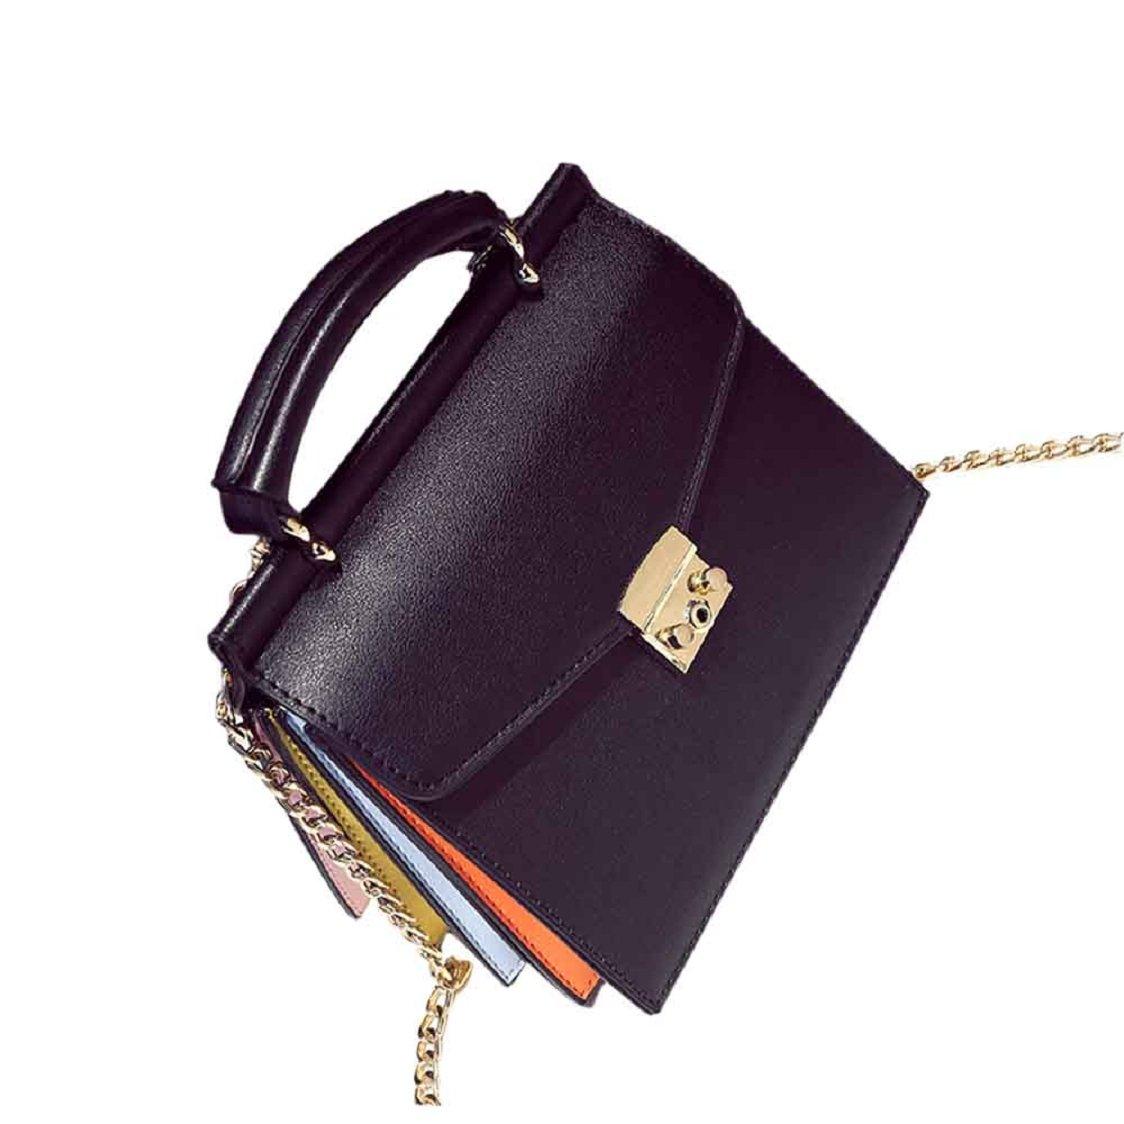 Sunfei Fashion Women Handbag Shoulder Bag Messenger Large Tote Leather Ladies Purse (Black)